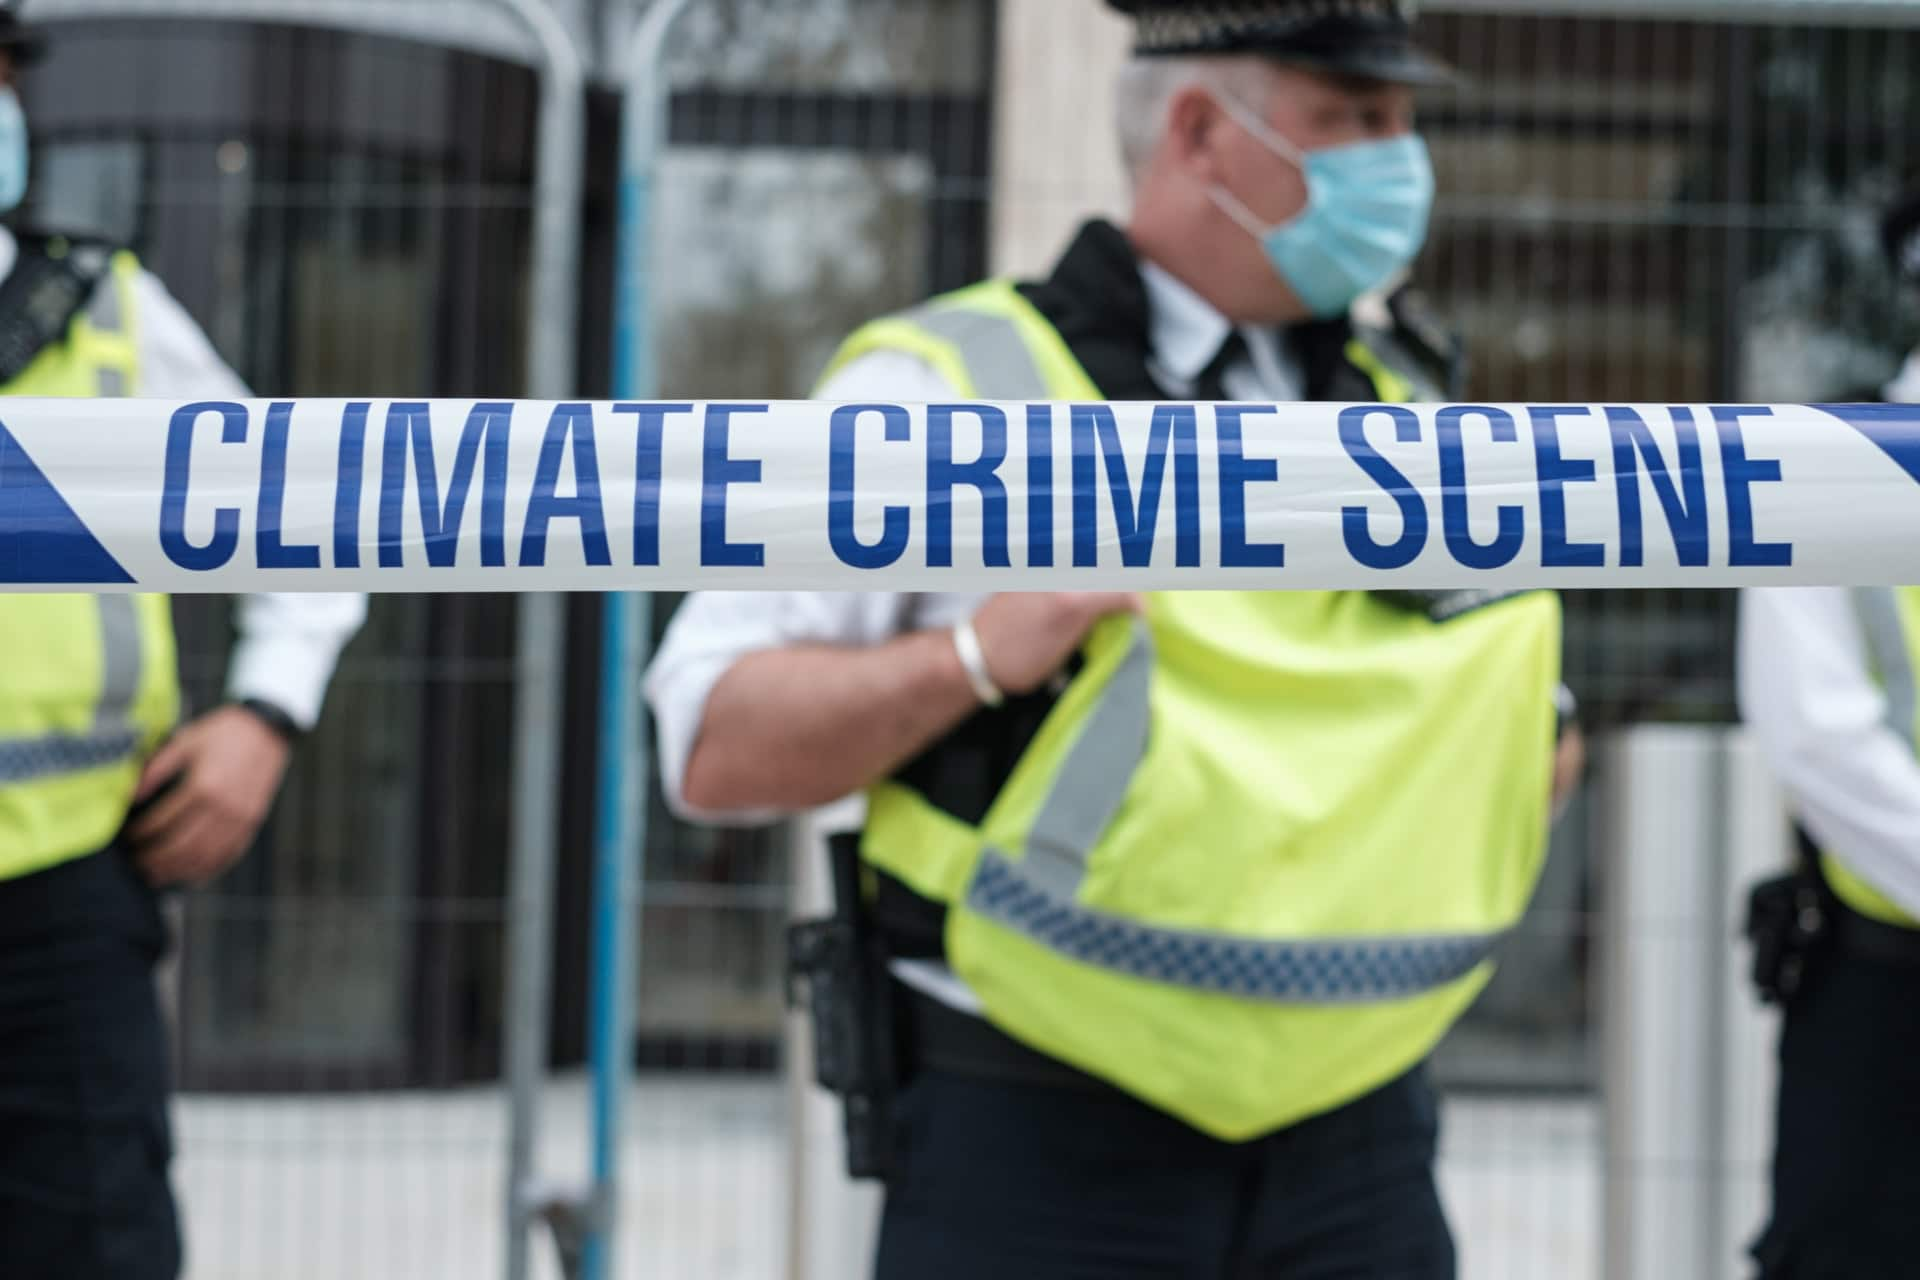 Finance News - Former BoE Head: Climate Crisis Demands Further Regulation